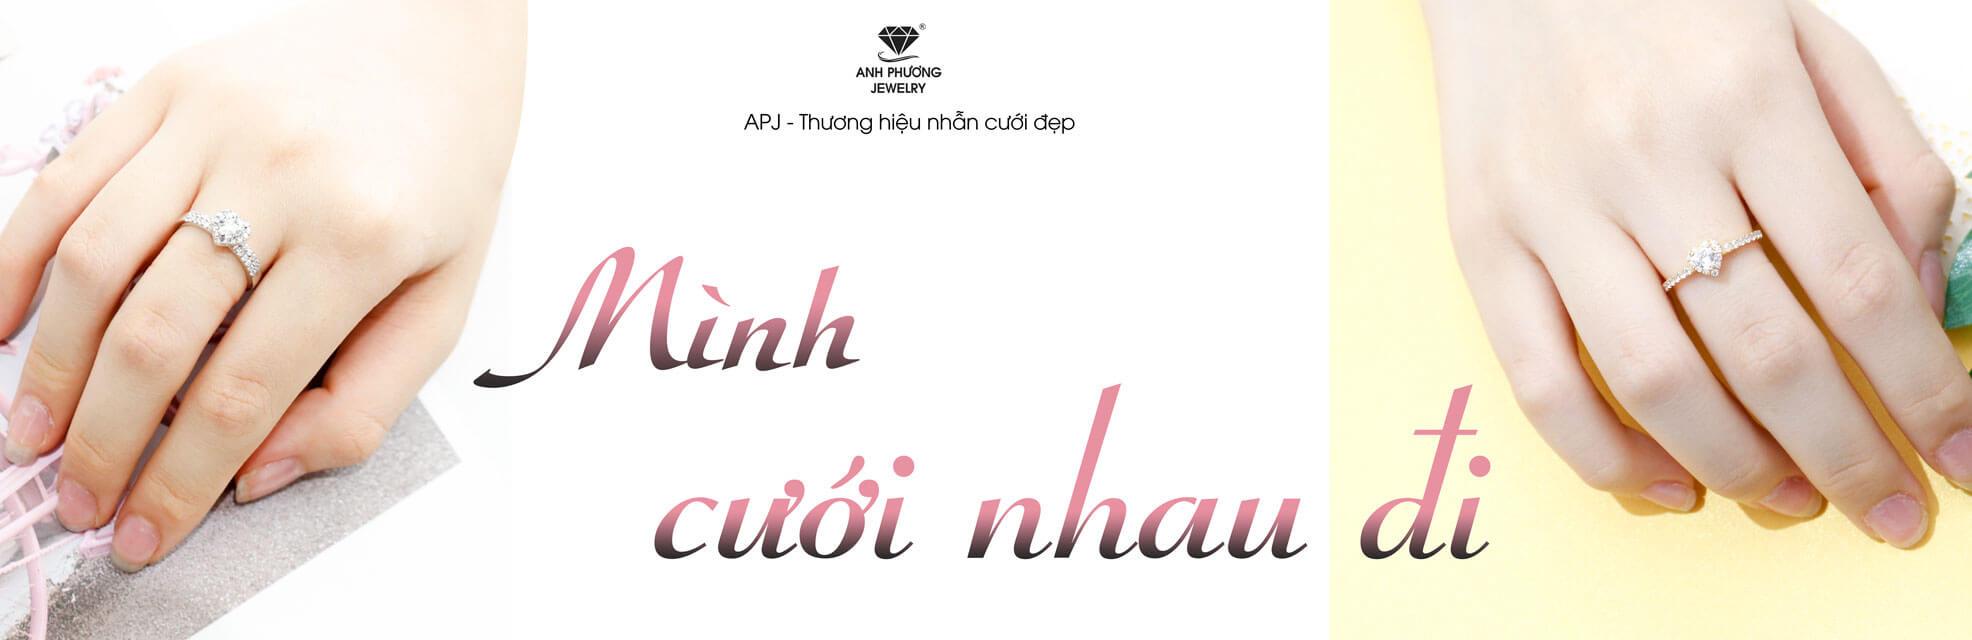 Banner desktop nhan dinh hon